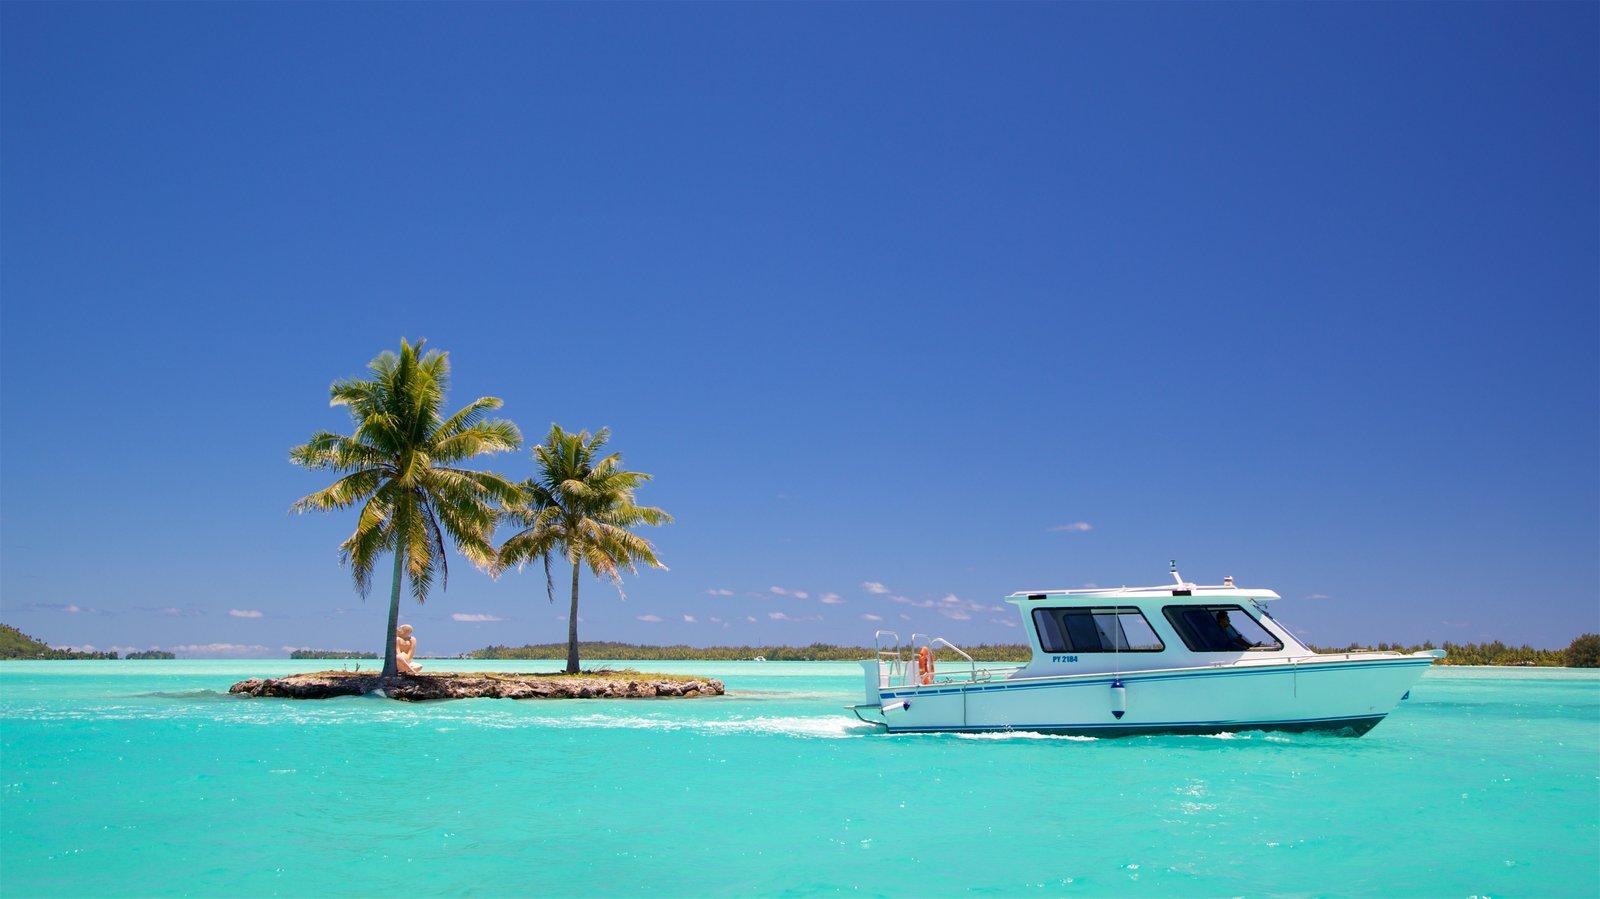 Bora Bora showing tropical scenes and boating